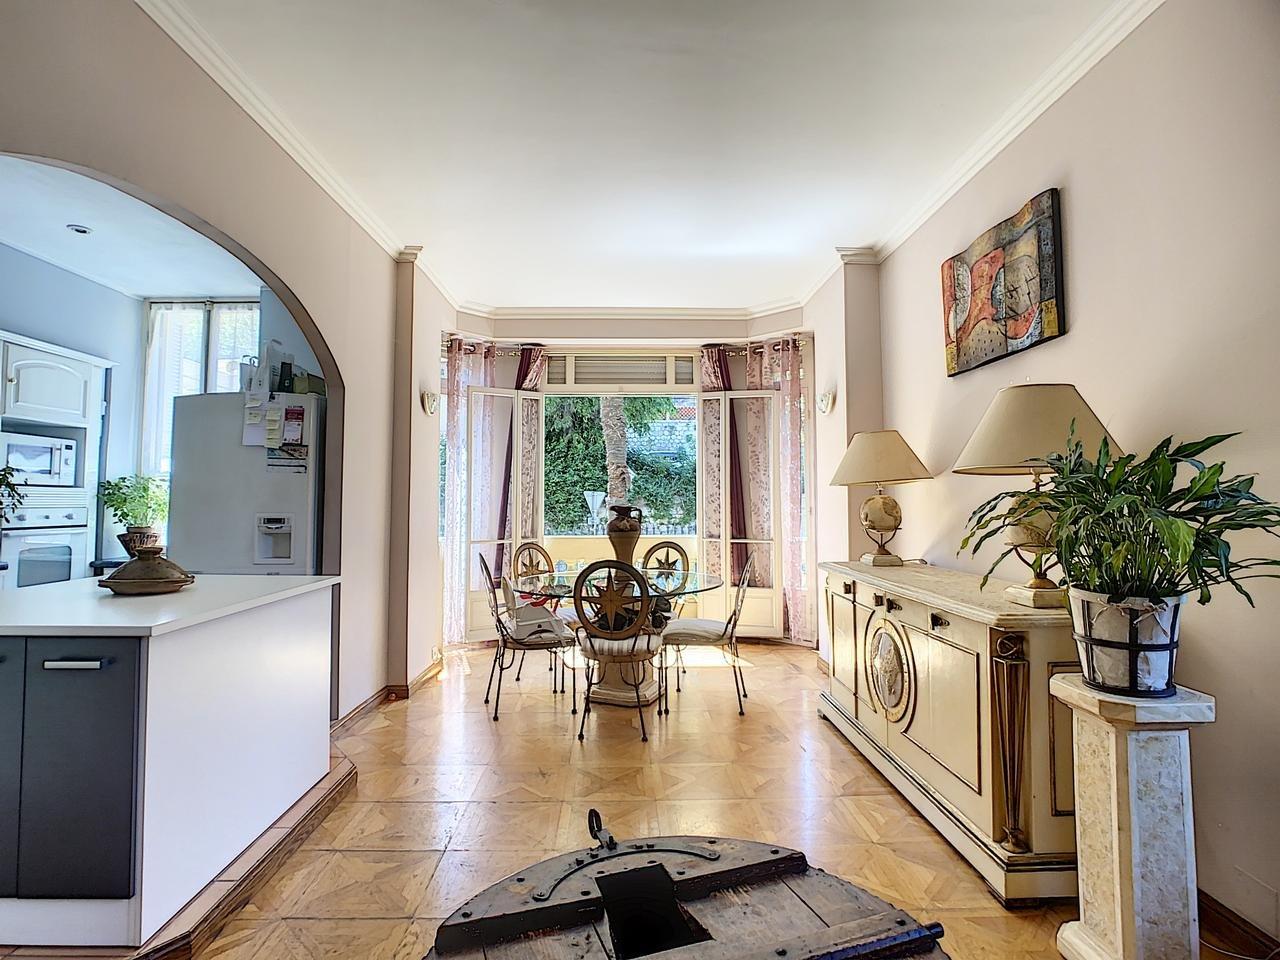 Appartement  3 Locali 73.82m2  In vendita   283750 €